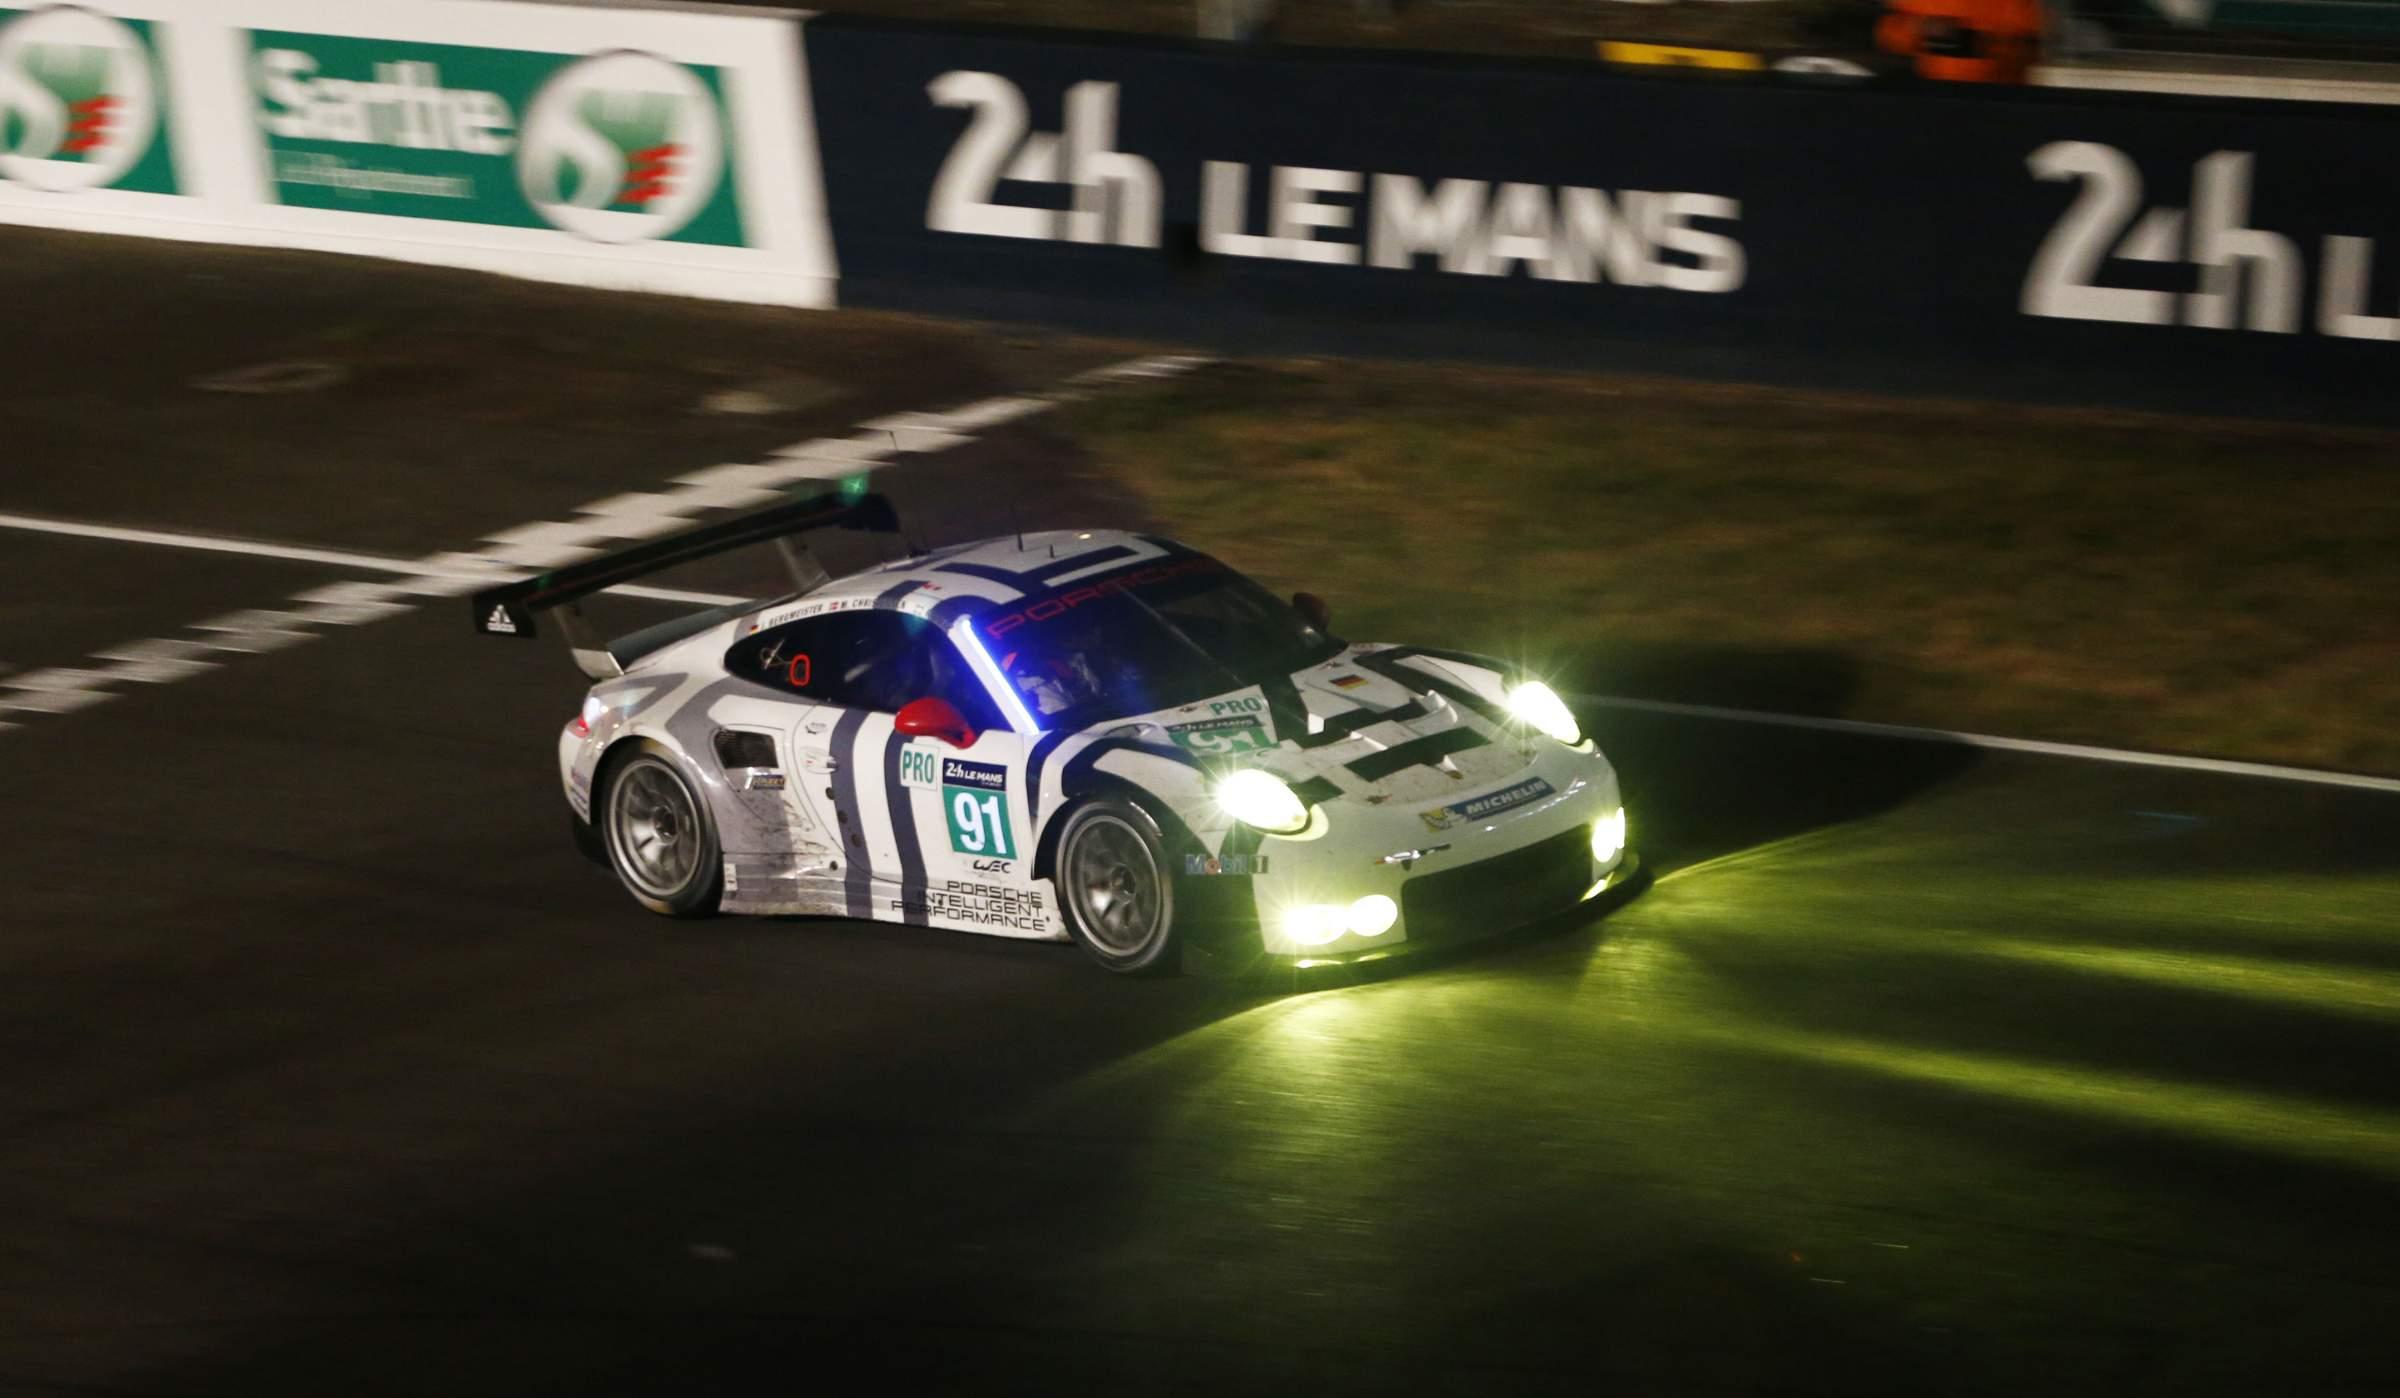 24hlemansrace2015122 Racingblog